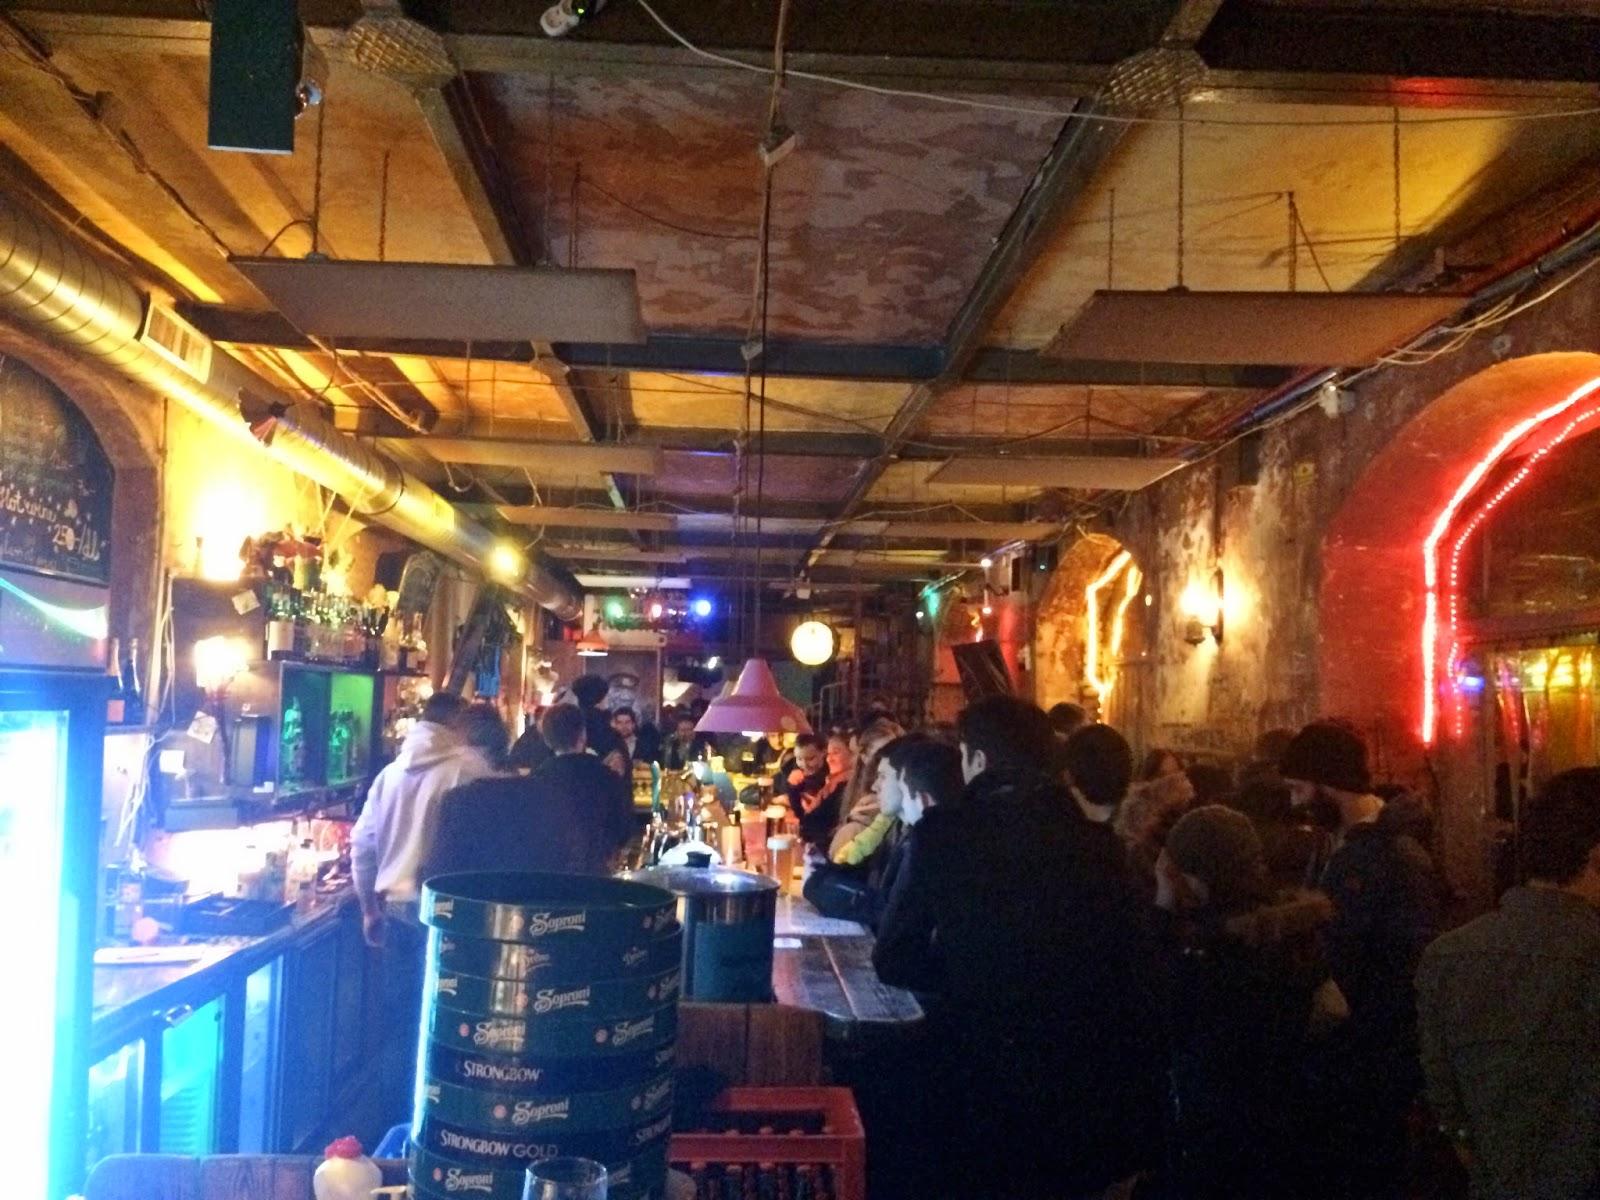 One of the bars inside Szimpla Kert